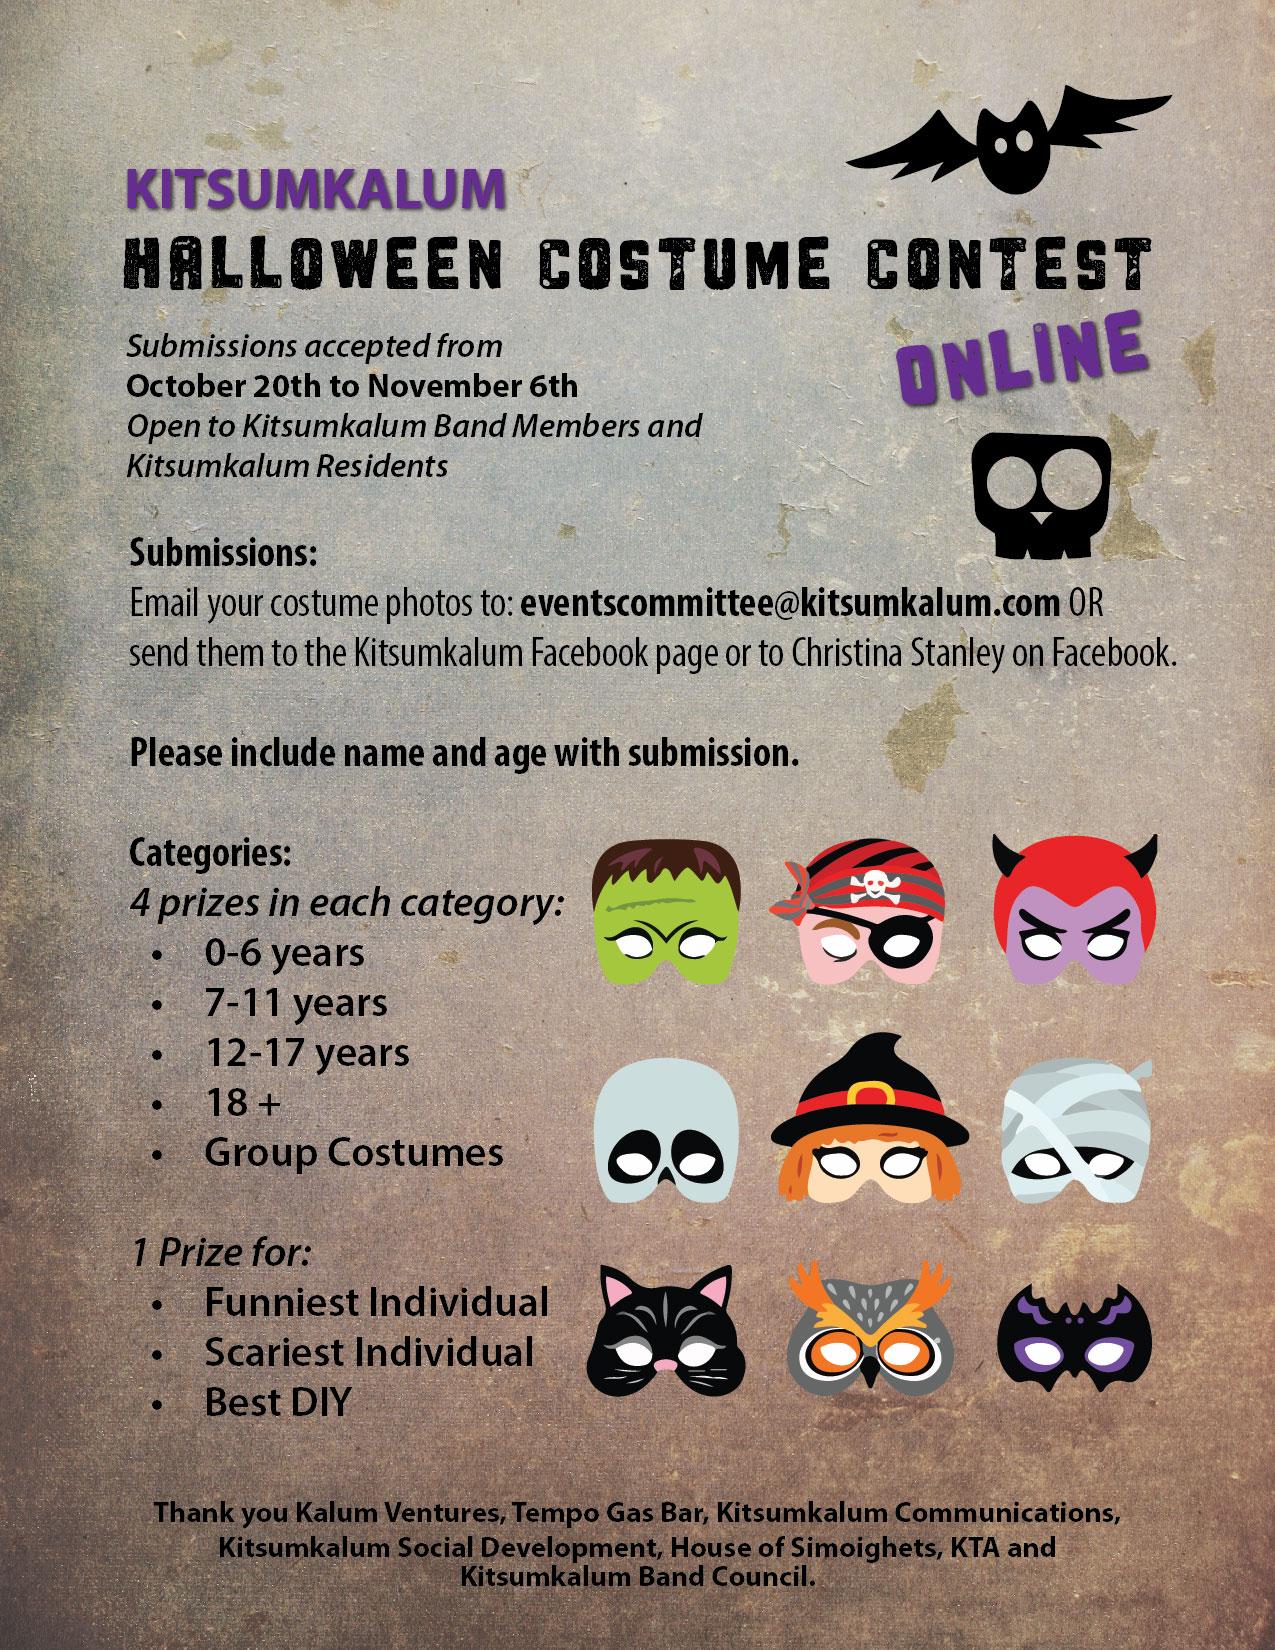 Kitsumkalum Halloween Costume Contest – Online